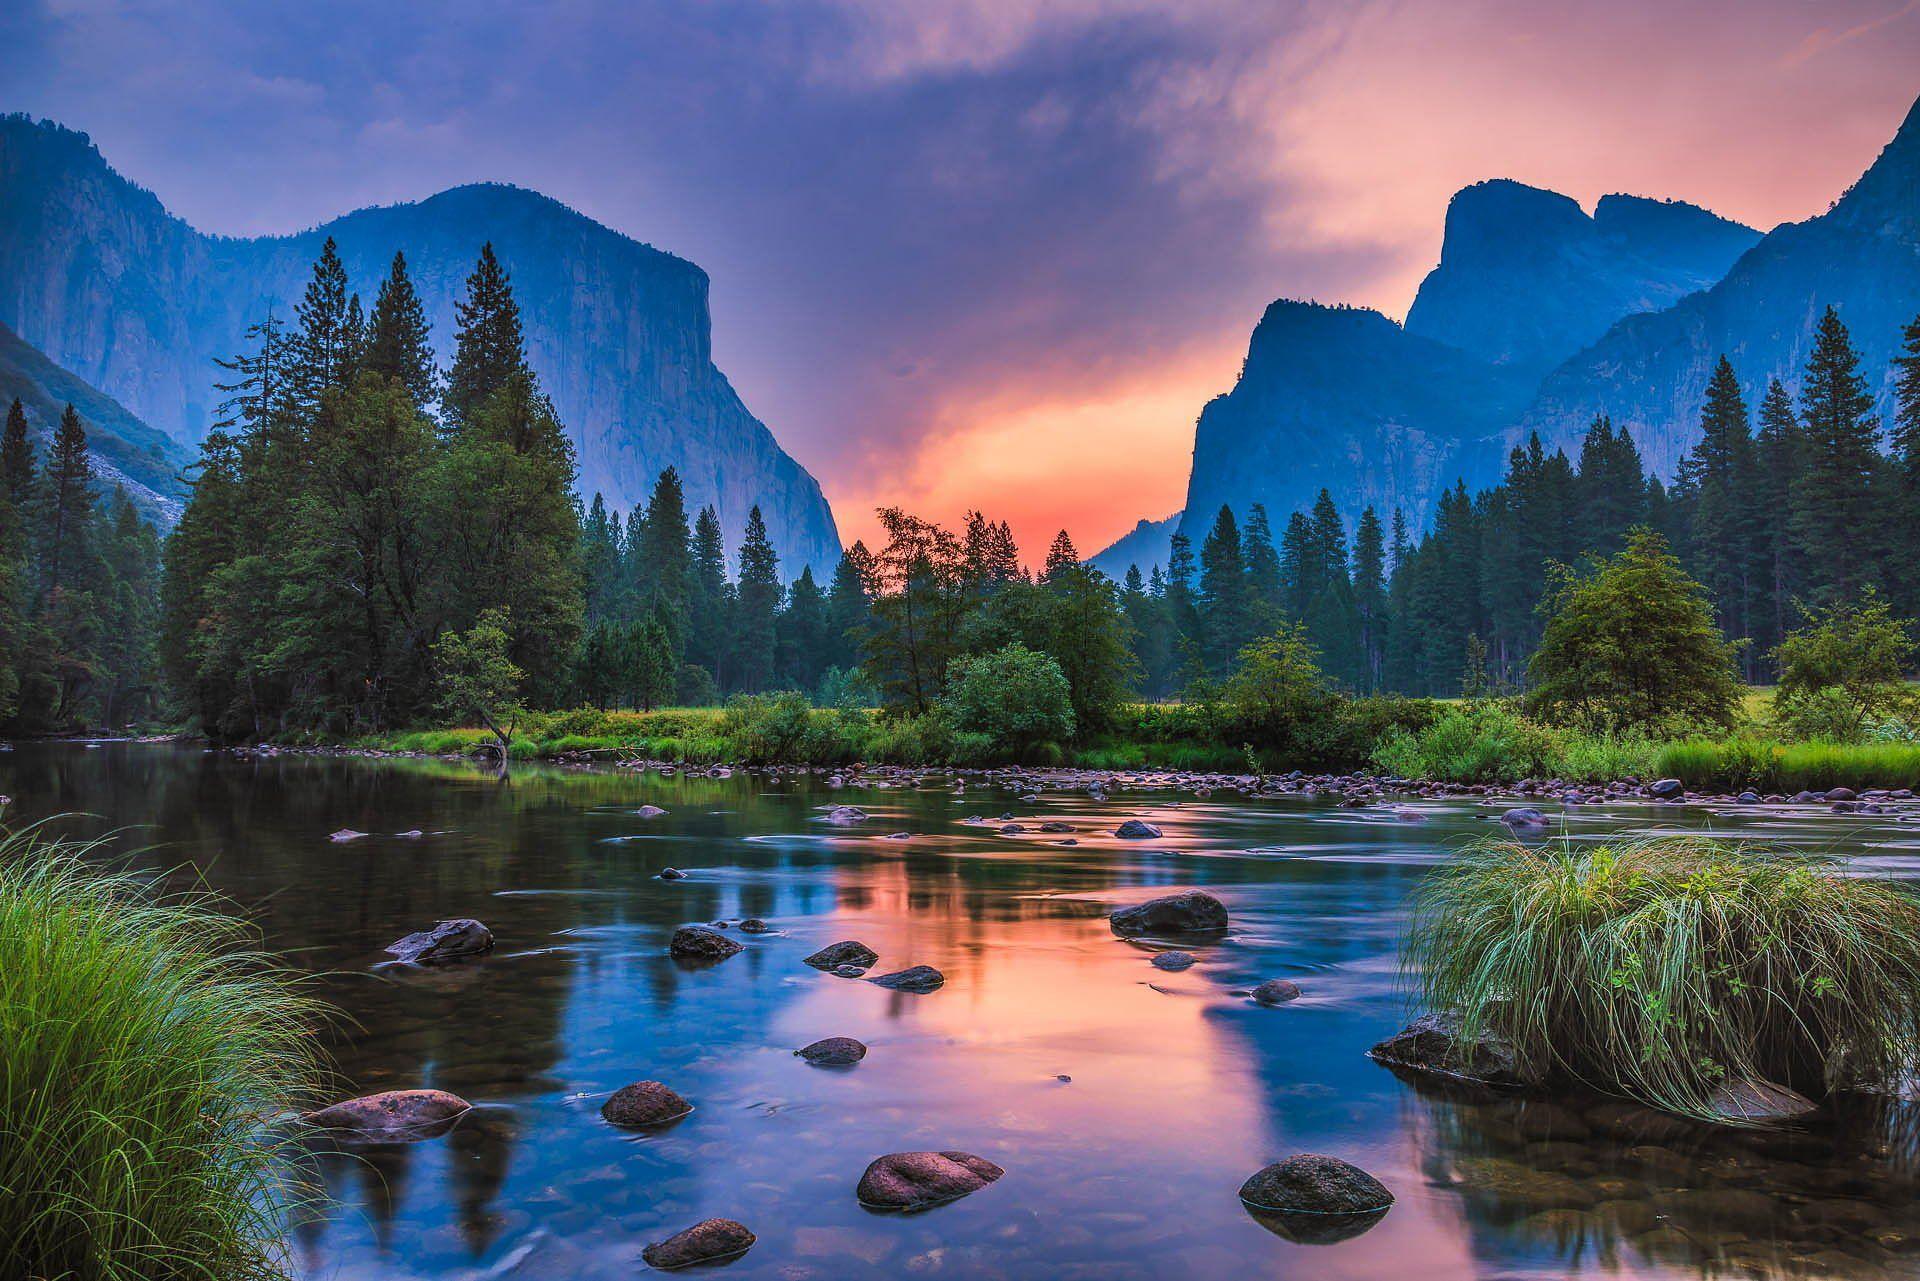 landscape nature sunset mountains